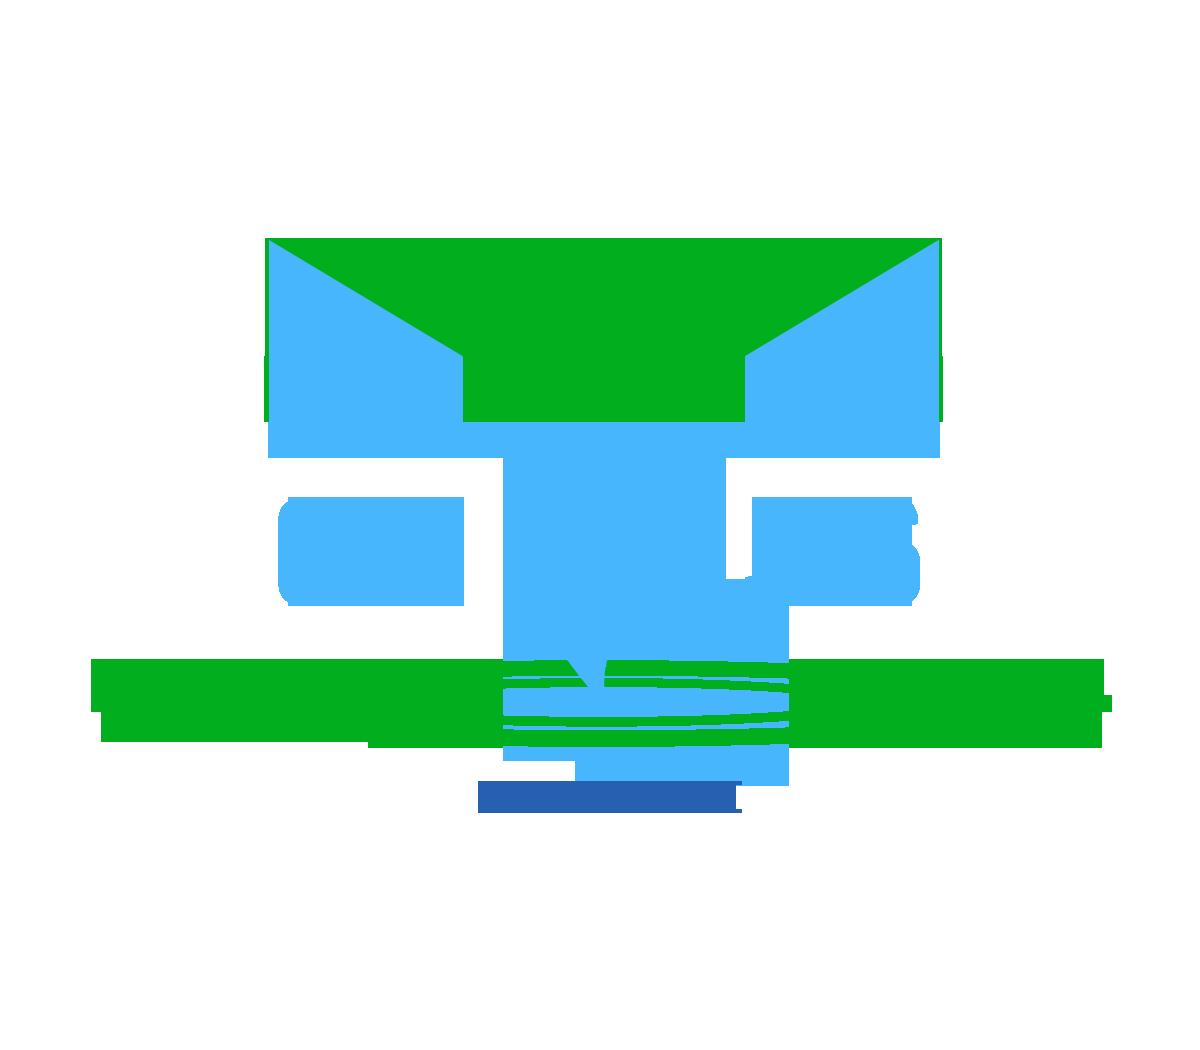 mygps-private-vehicles-paragraph-image